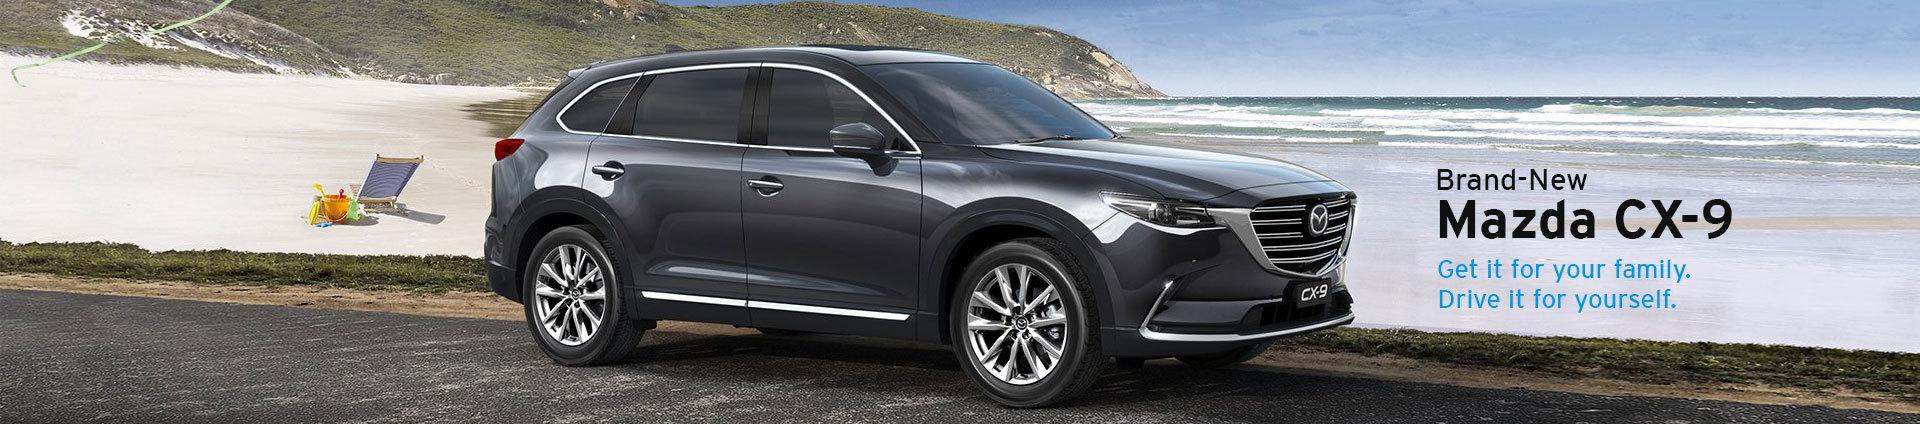 Brand New Mazda CX-9